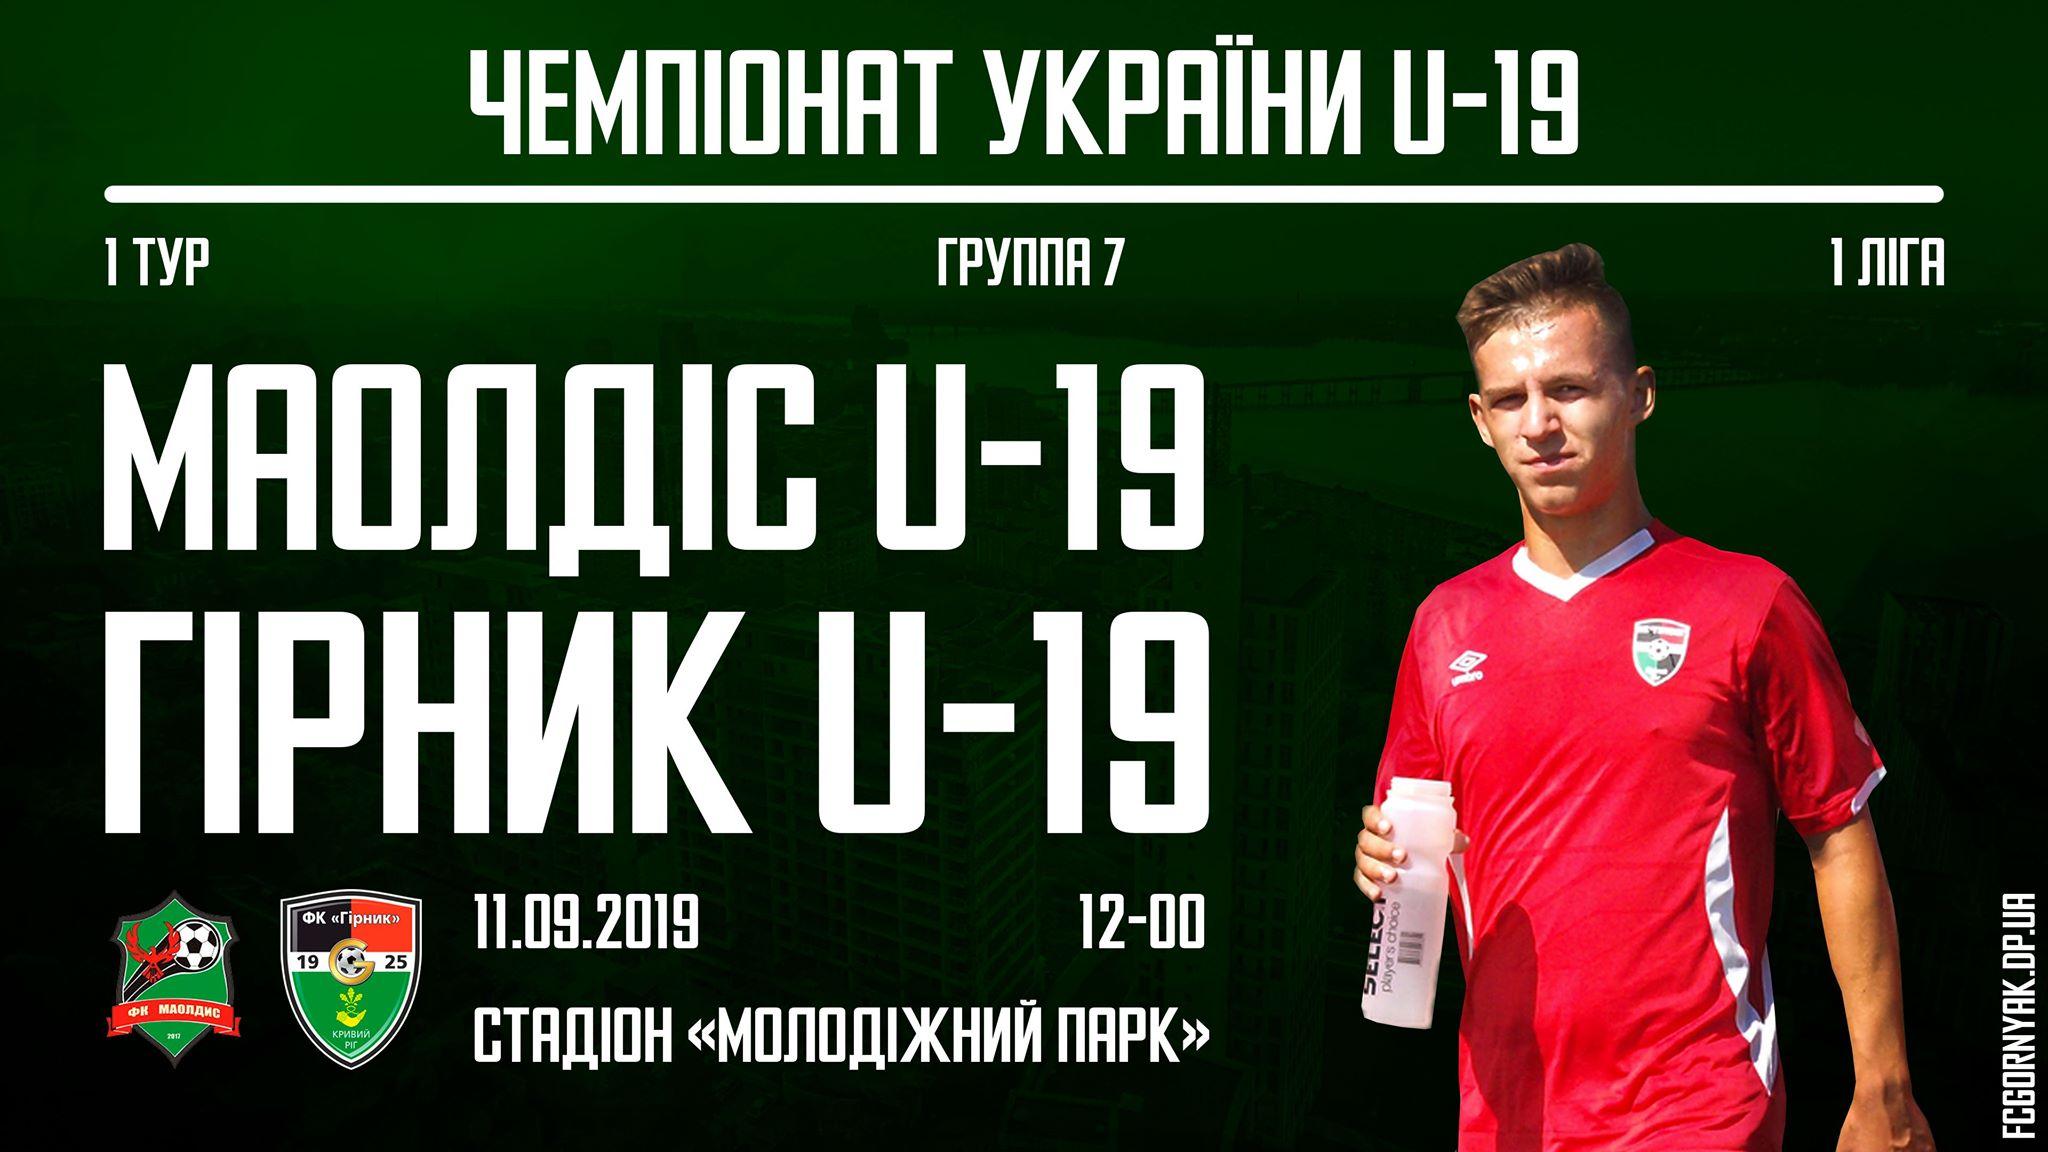 """Маолдис U-19"" - ""Горняк U-19"": детали матча"